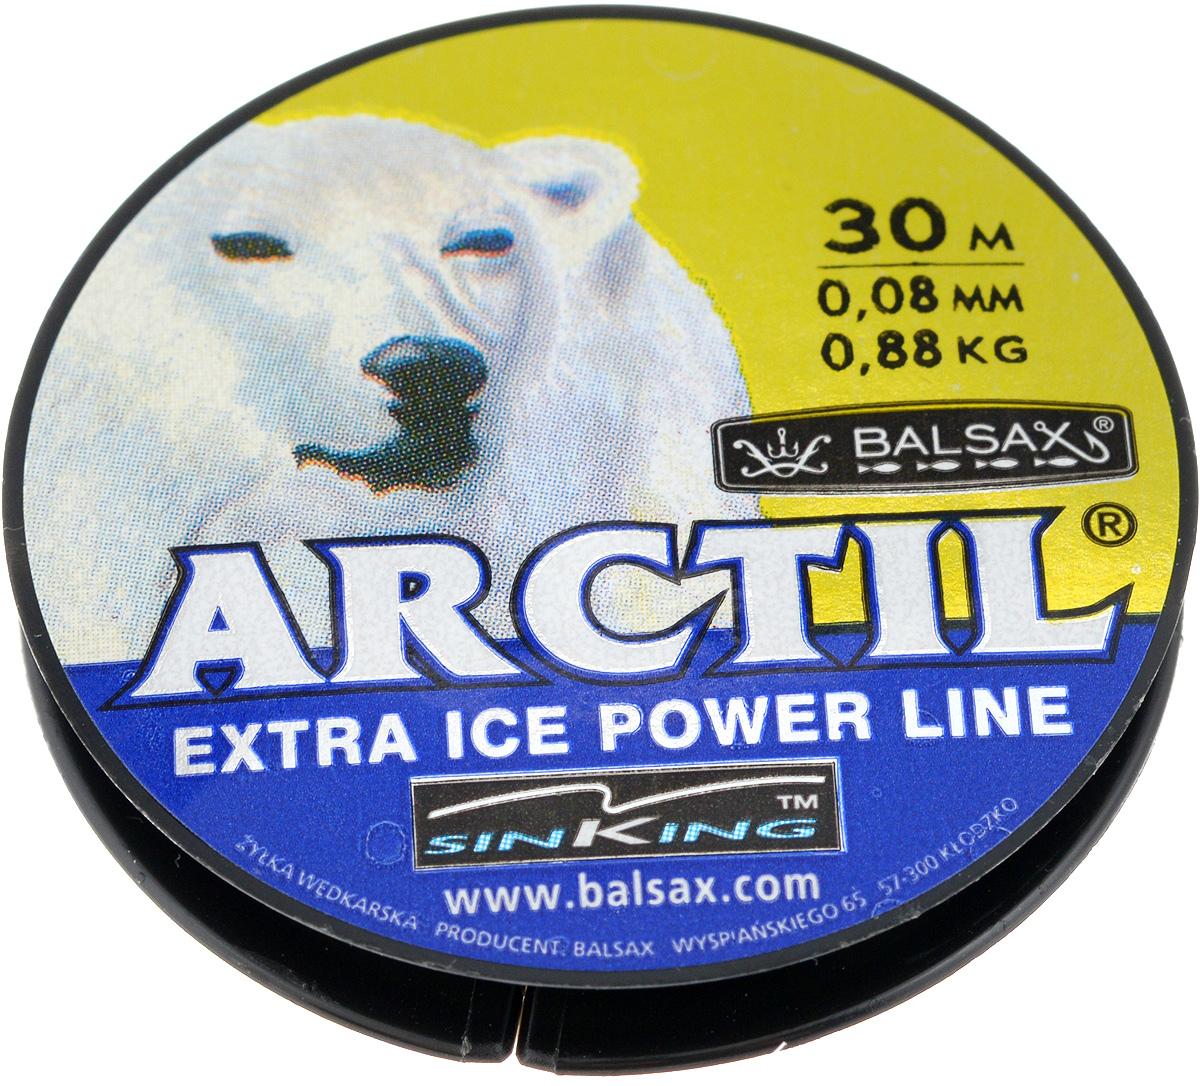 Леска зимняя Balsax Arctil, 30 м, 0,08 мм, 0,88 кг